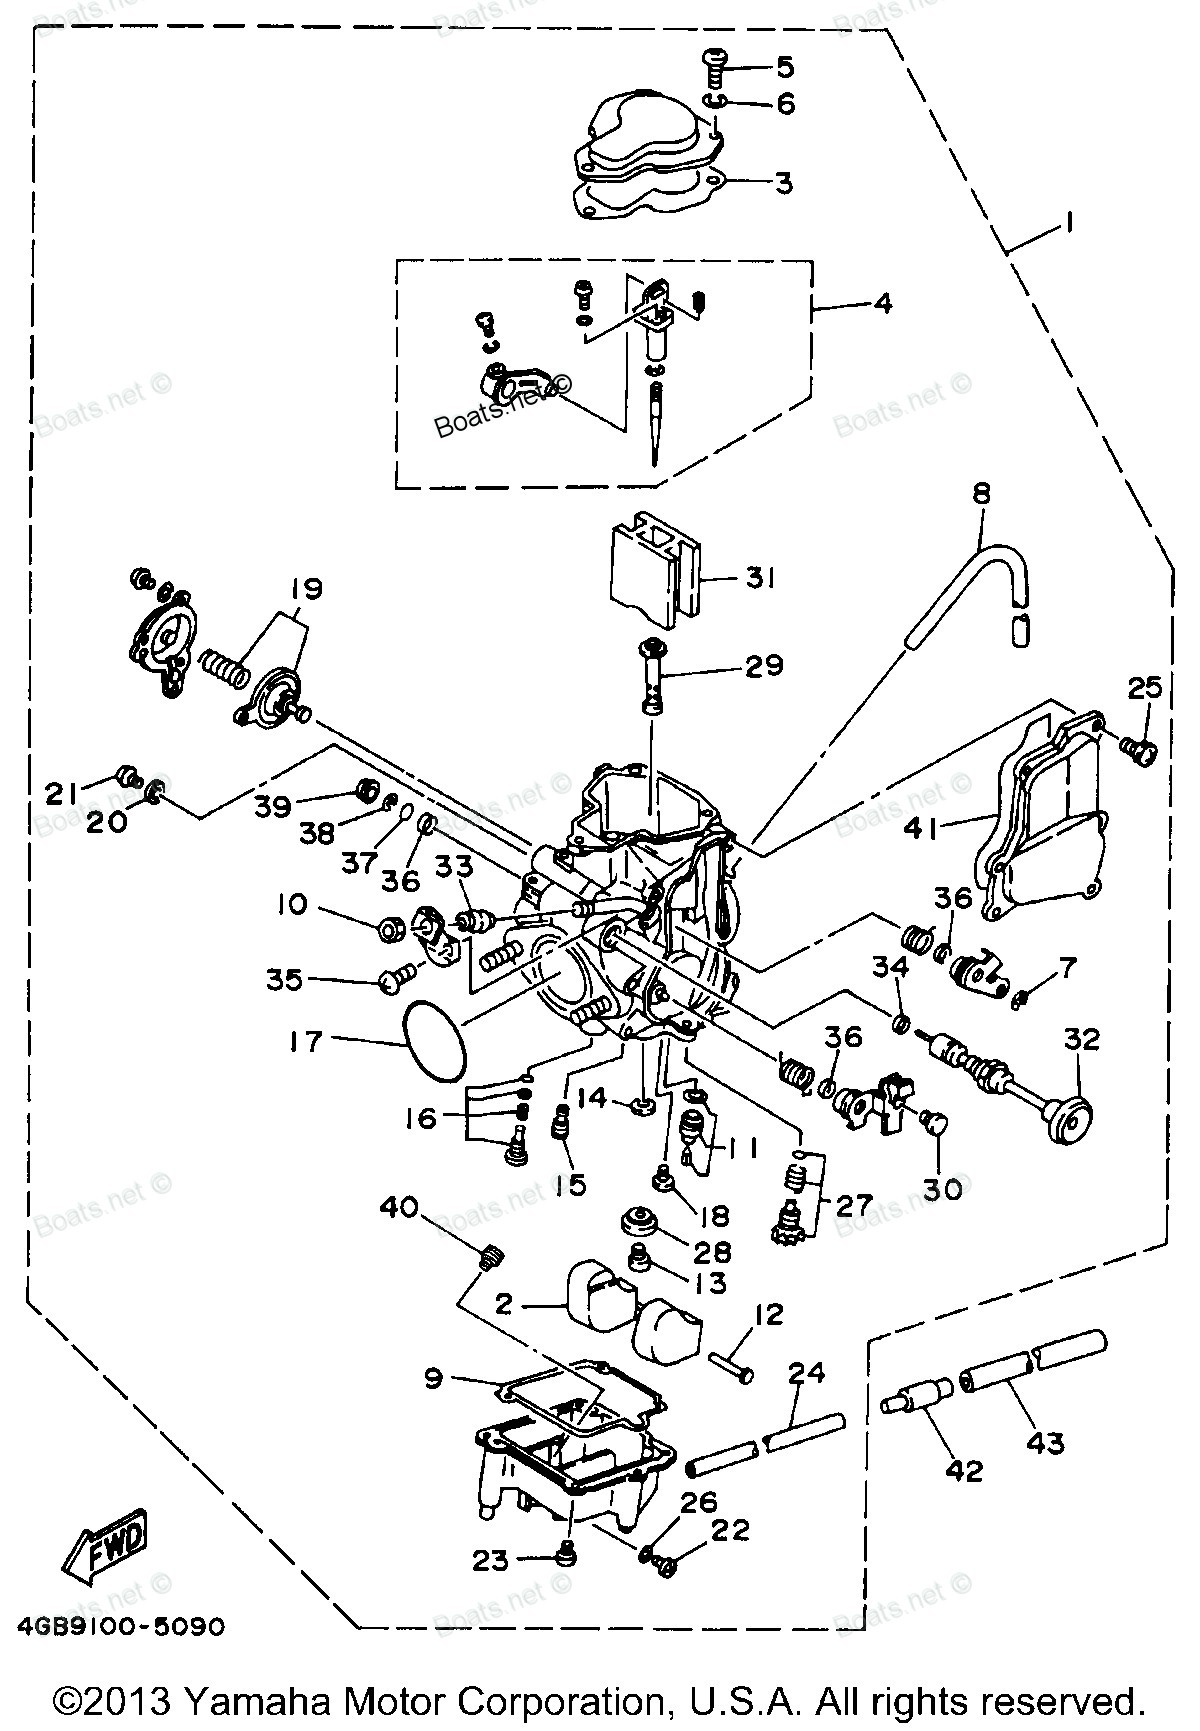 350 engine firing order diagram chevy hei distributor wiring diagram chevy wiring diagram of 350 engine